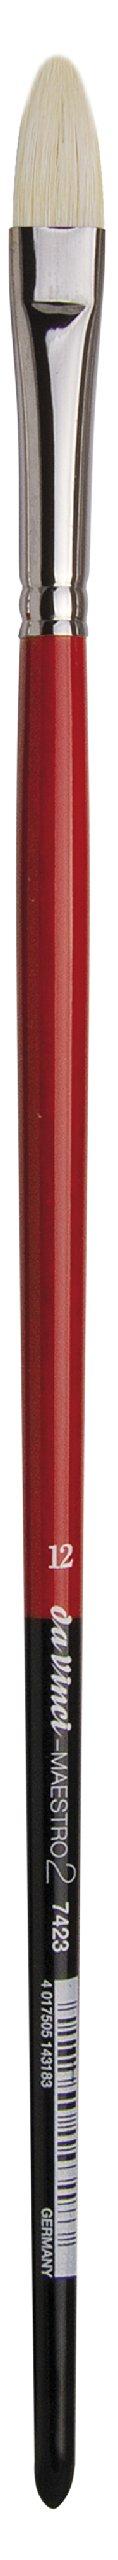 da Vinci Hog Bristle Series 7423 Maestro 2 Artist Paint Brush, Filbert with European Sizing, Size 12